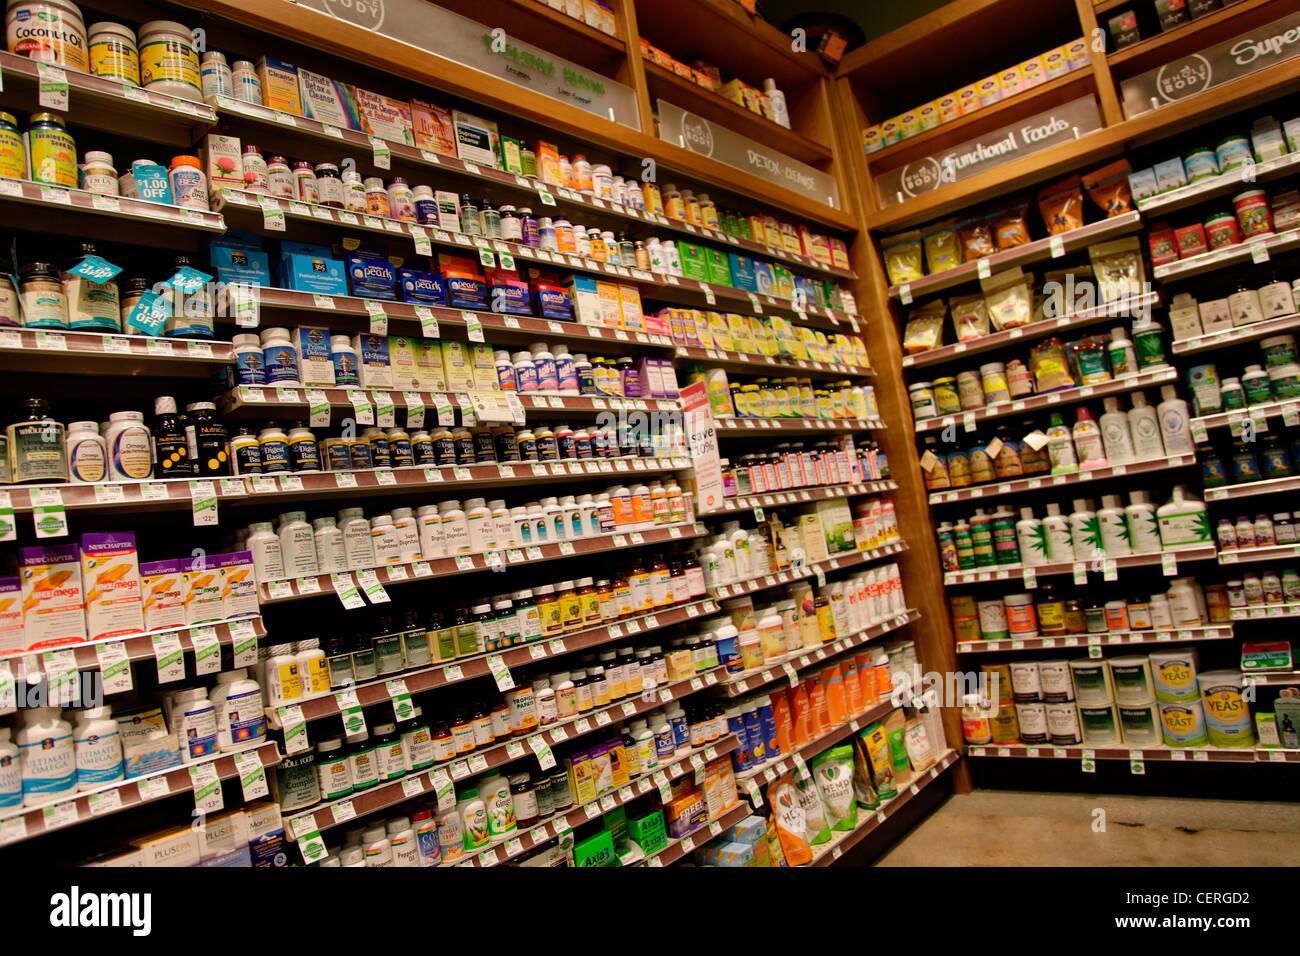 VITAMINS ON SALE IN USA SUPERMARKET - Stock Image